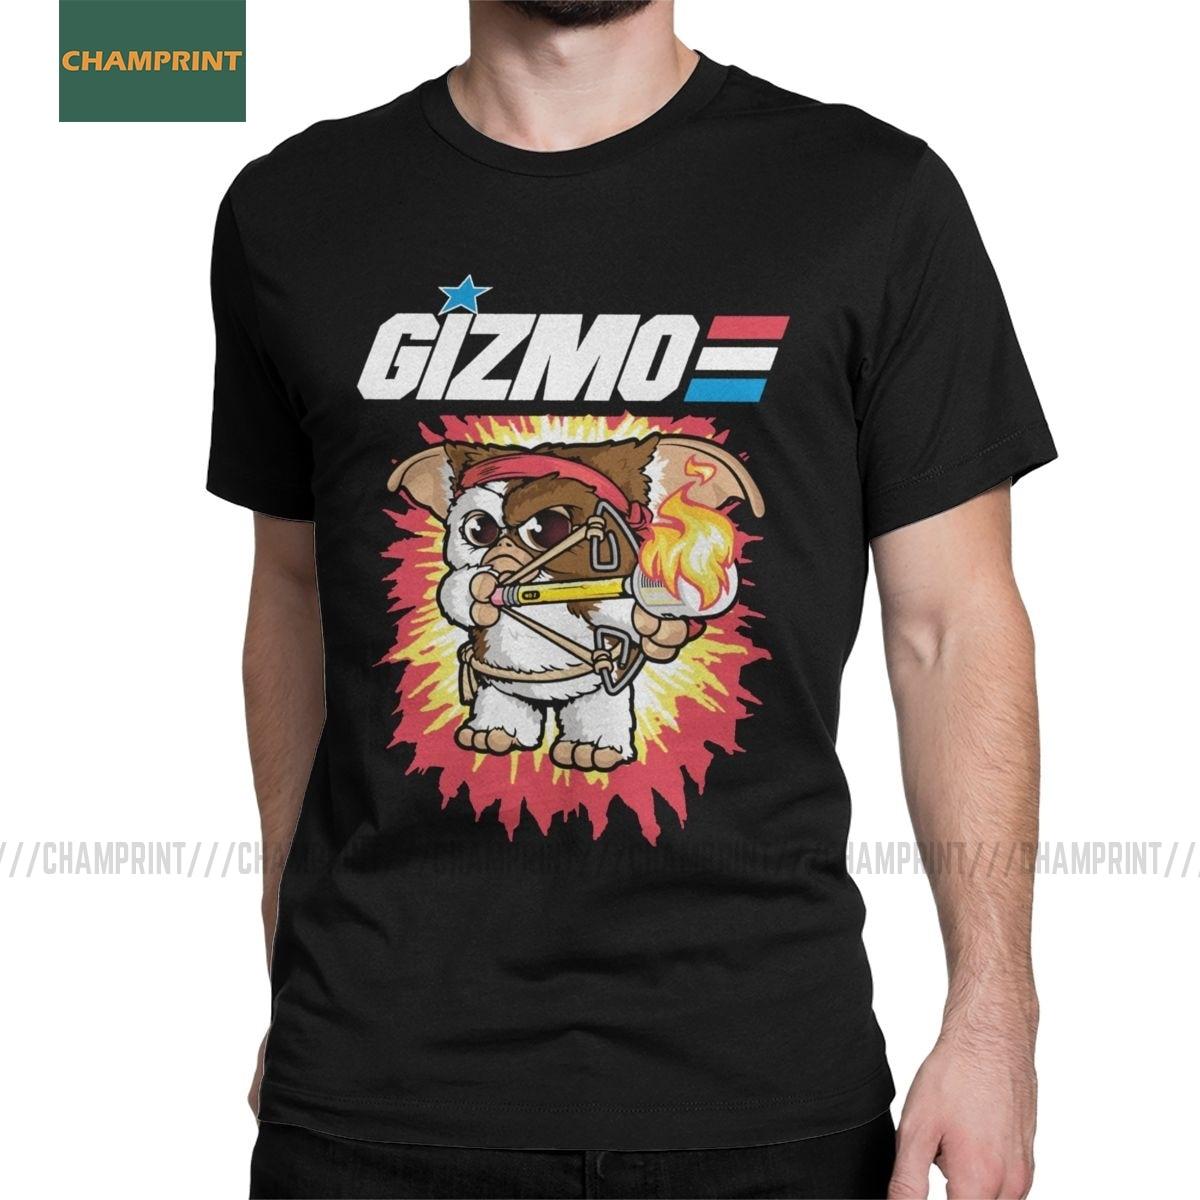 Gremlins T-Shirt for Men Gizmo 80s Movie Mogwai Monster Retro Sci Fi Casual Cotton Tees Short Sleeve T Shirt 4XL 5XL 6XL Tops